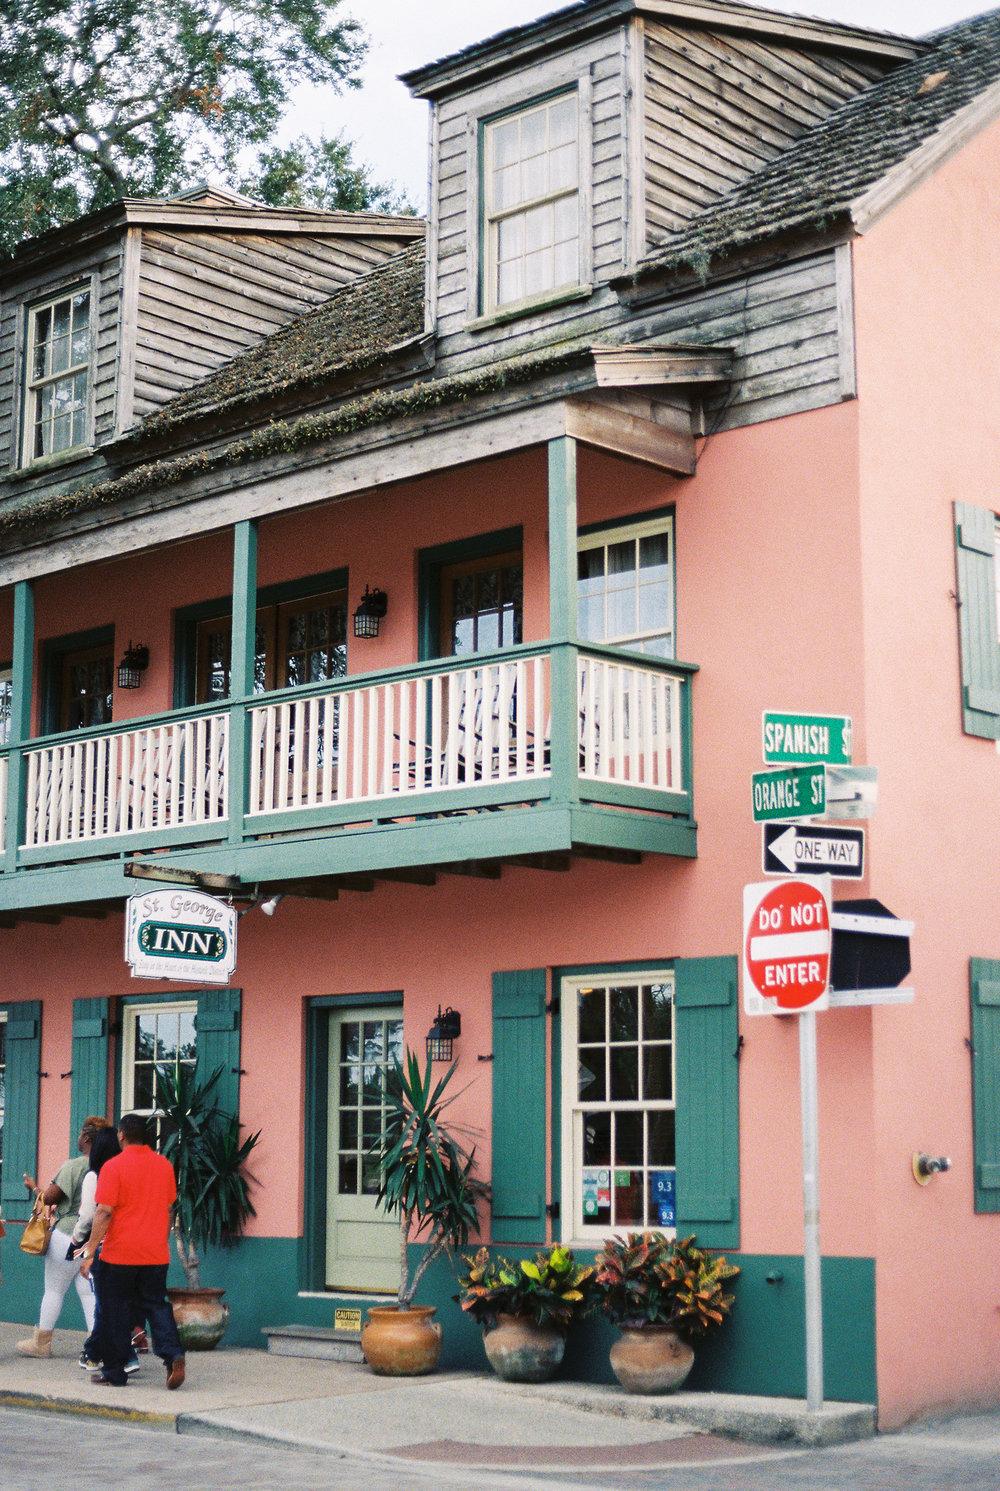 st augustine downtown orange street, king street, and spanish street architecture photo